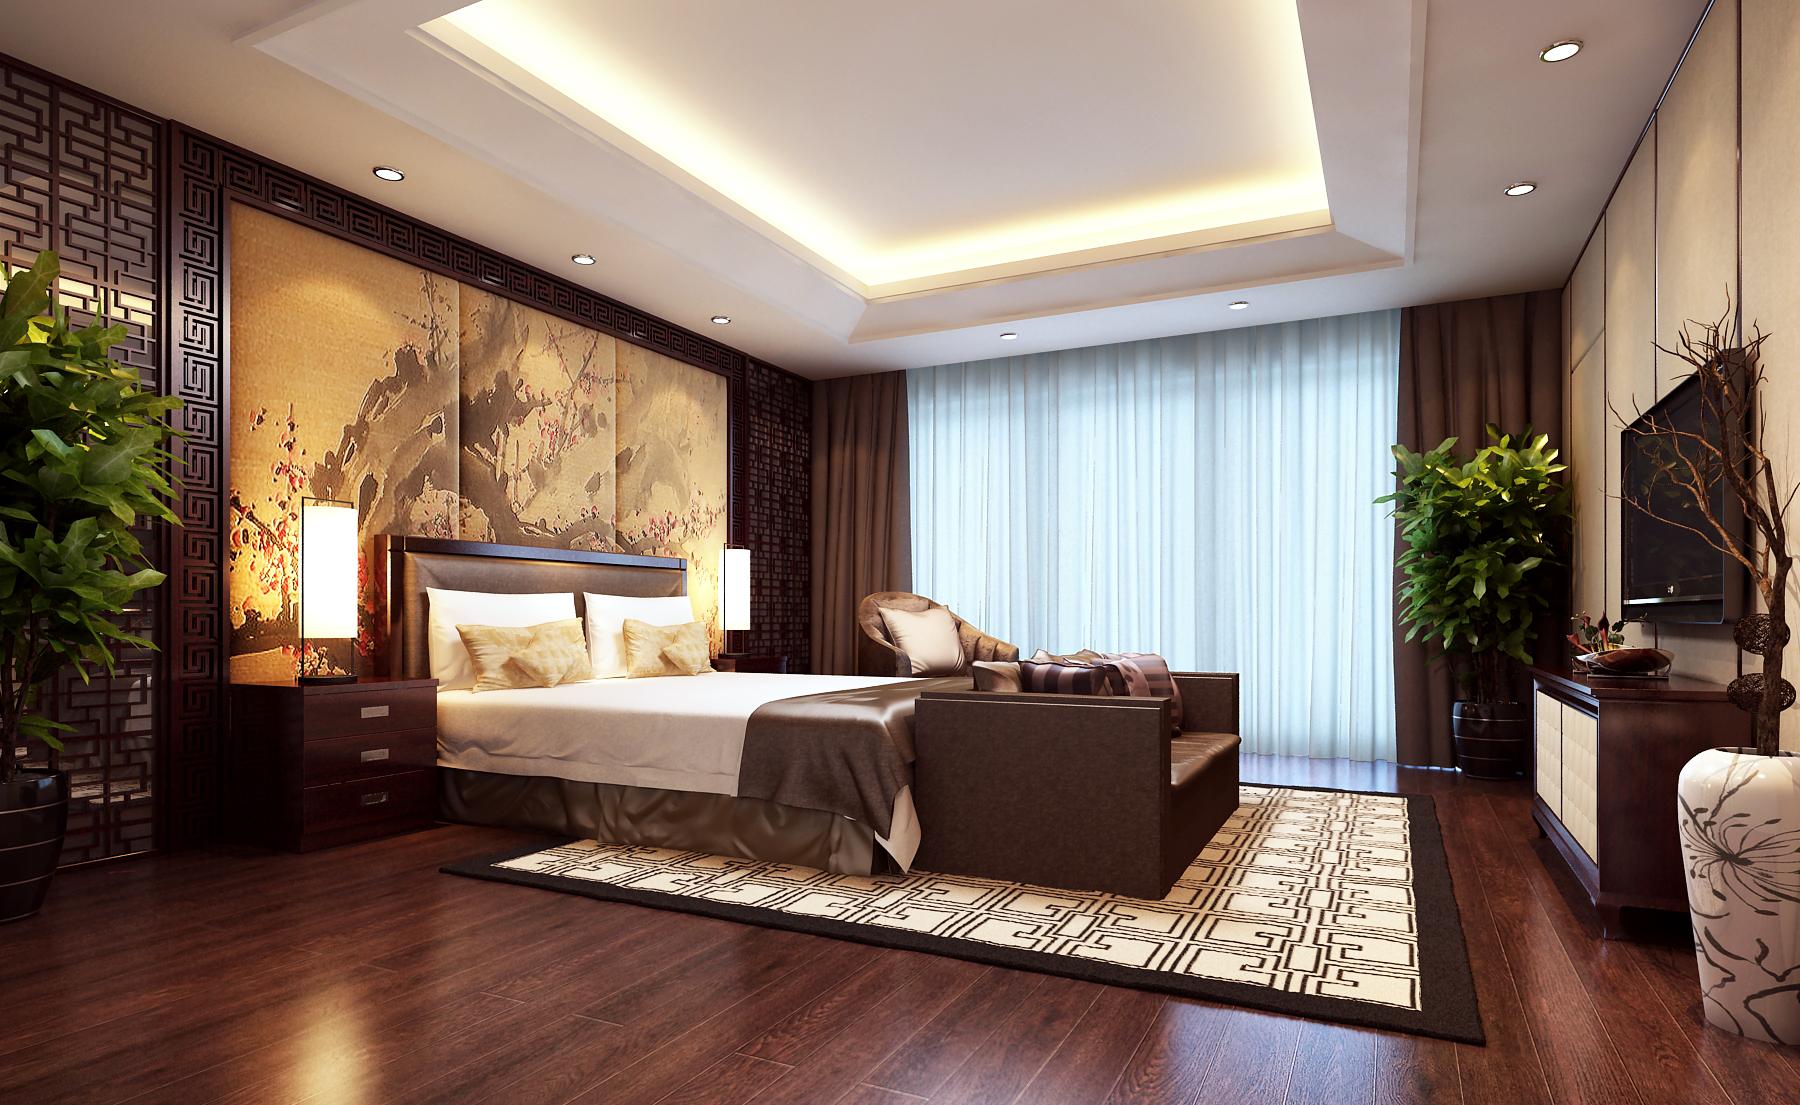 Modern Brown Bedroom 3D Model MAX | CGTrader.com on New Model Bedroom Design  id=56270